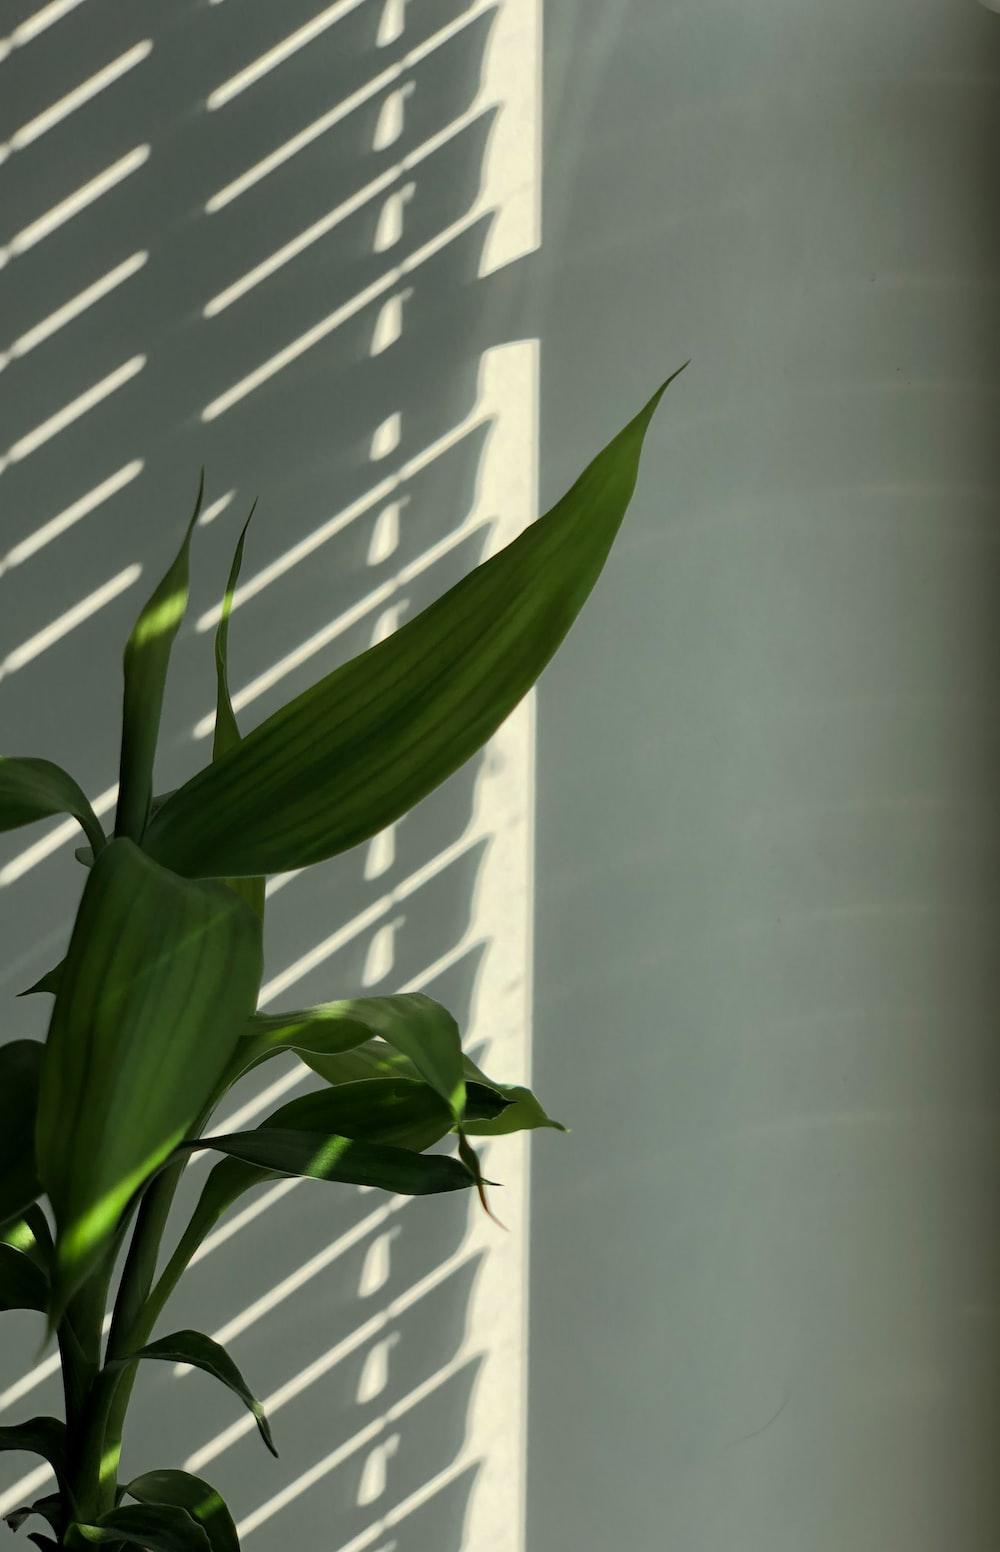 green plant near white window blinds